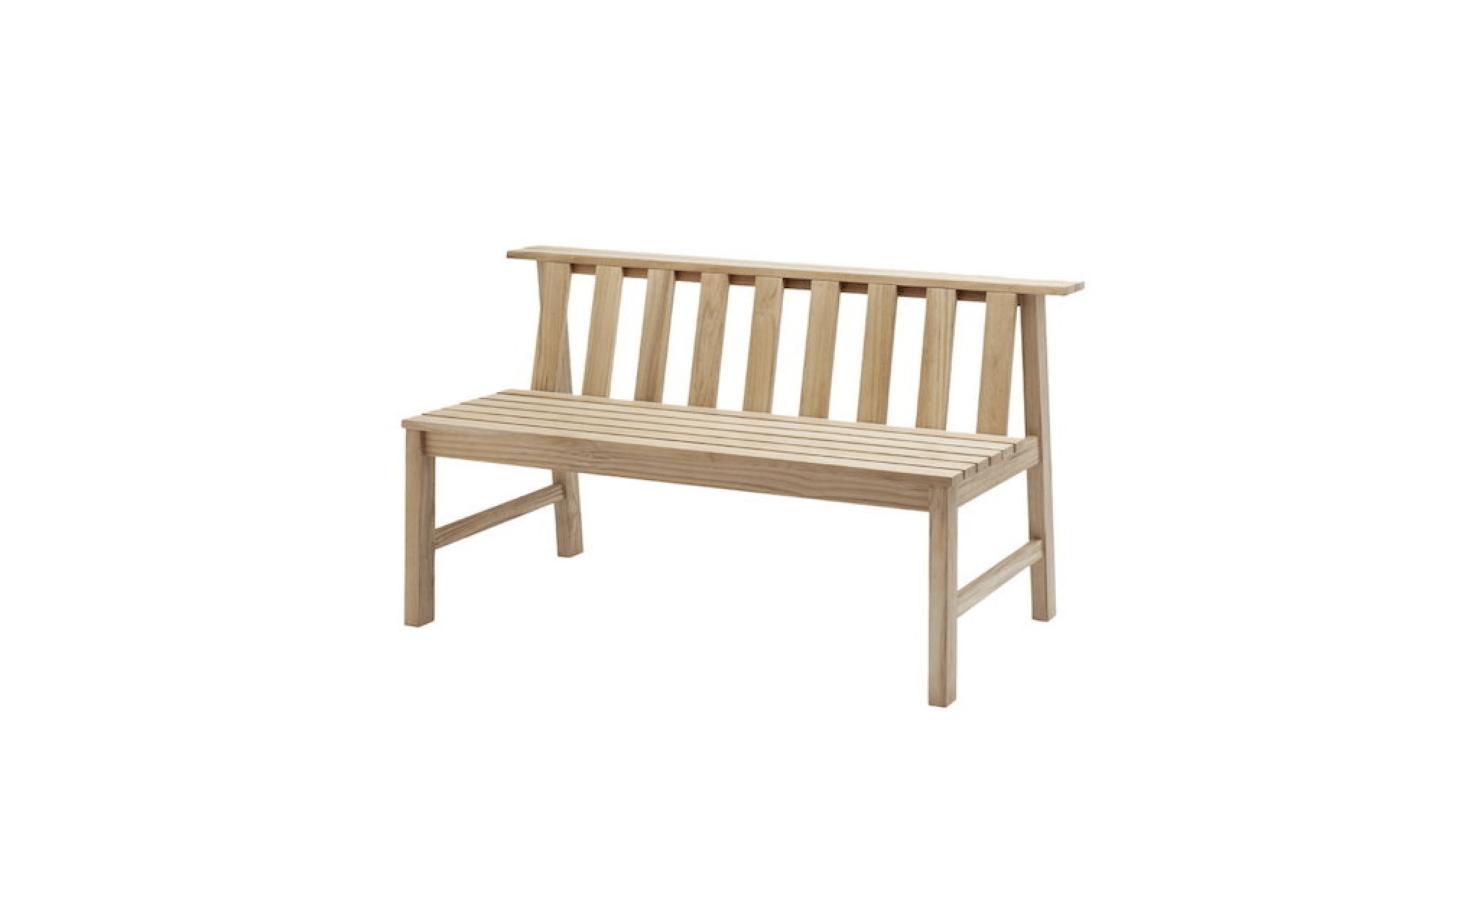 Outstanding 10 Easy Pieces Wooden Garden Benches Gardenista Cjindustries Chair Design For Home Cjindustriesco